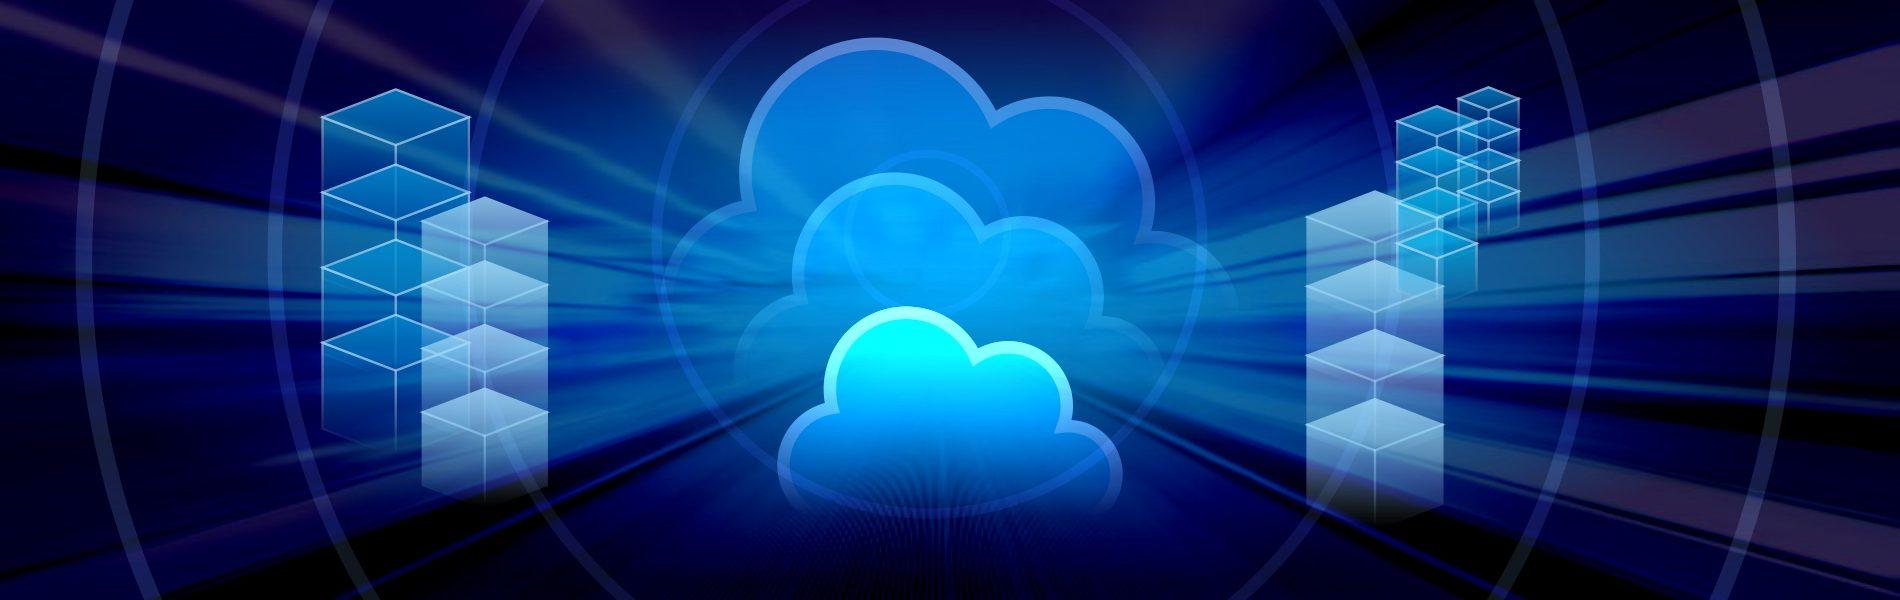 Blog Header Future of Cloud Computing 1900 x600